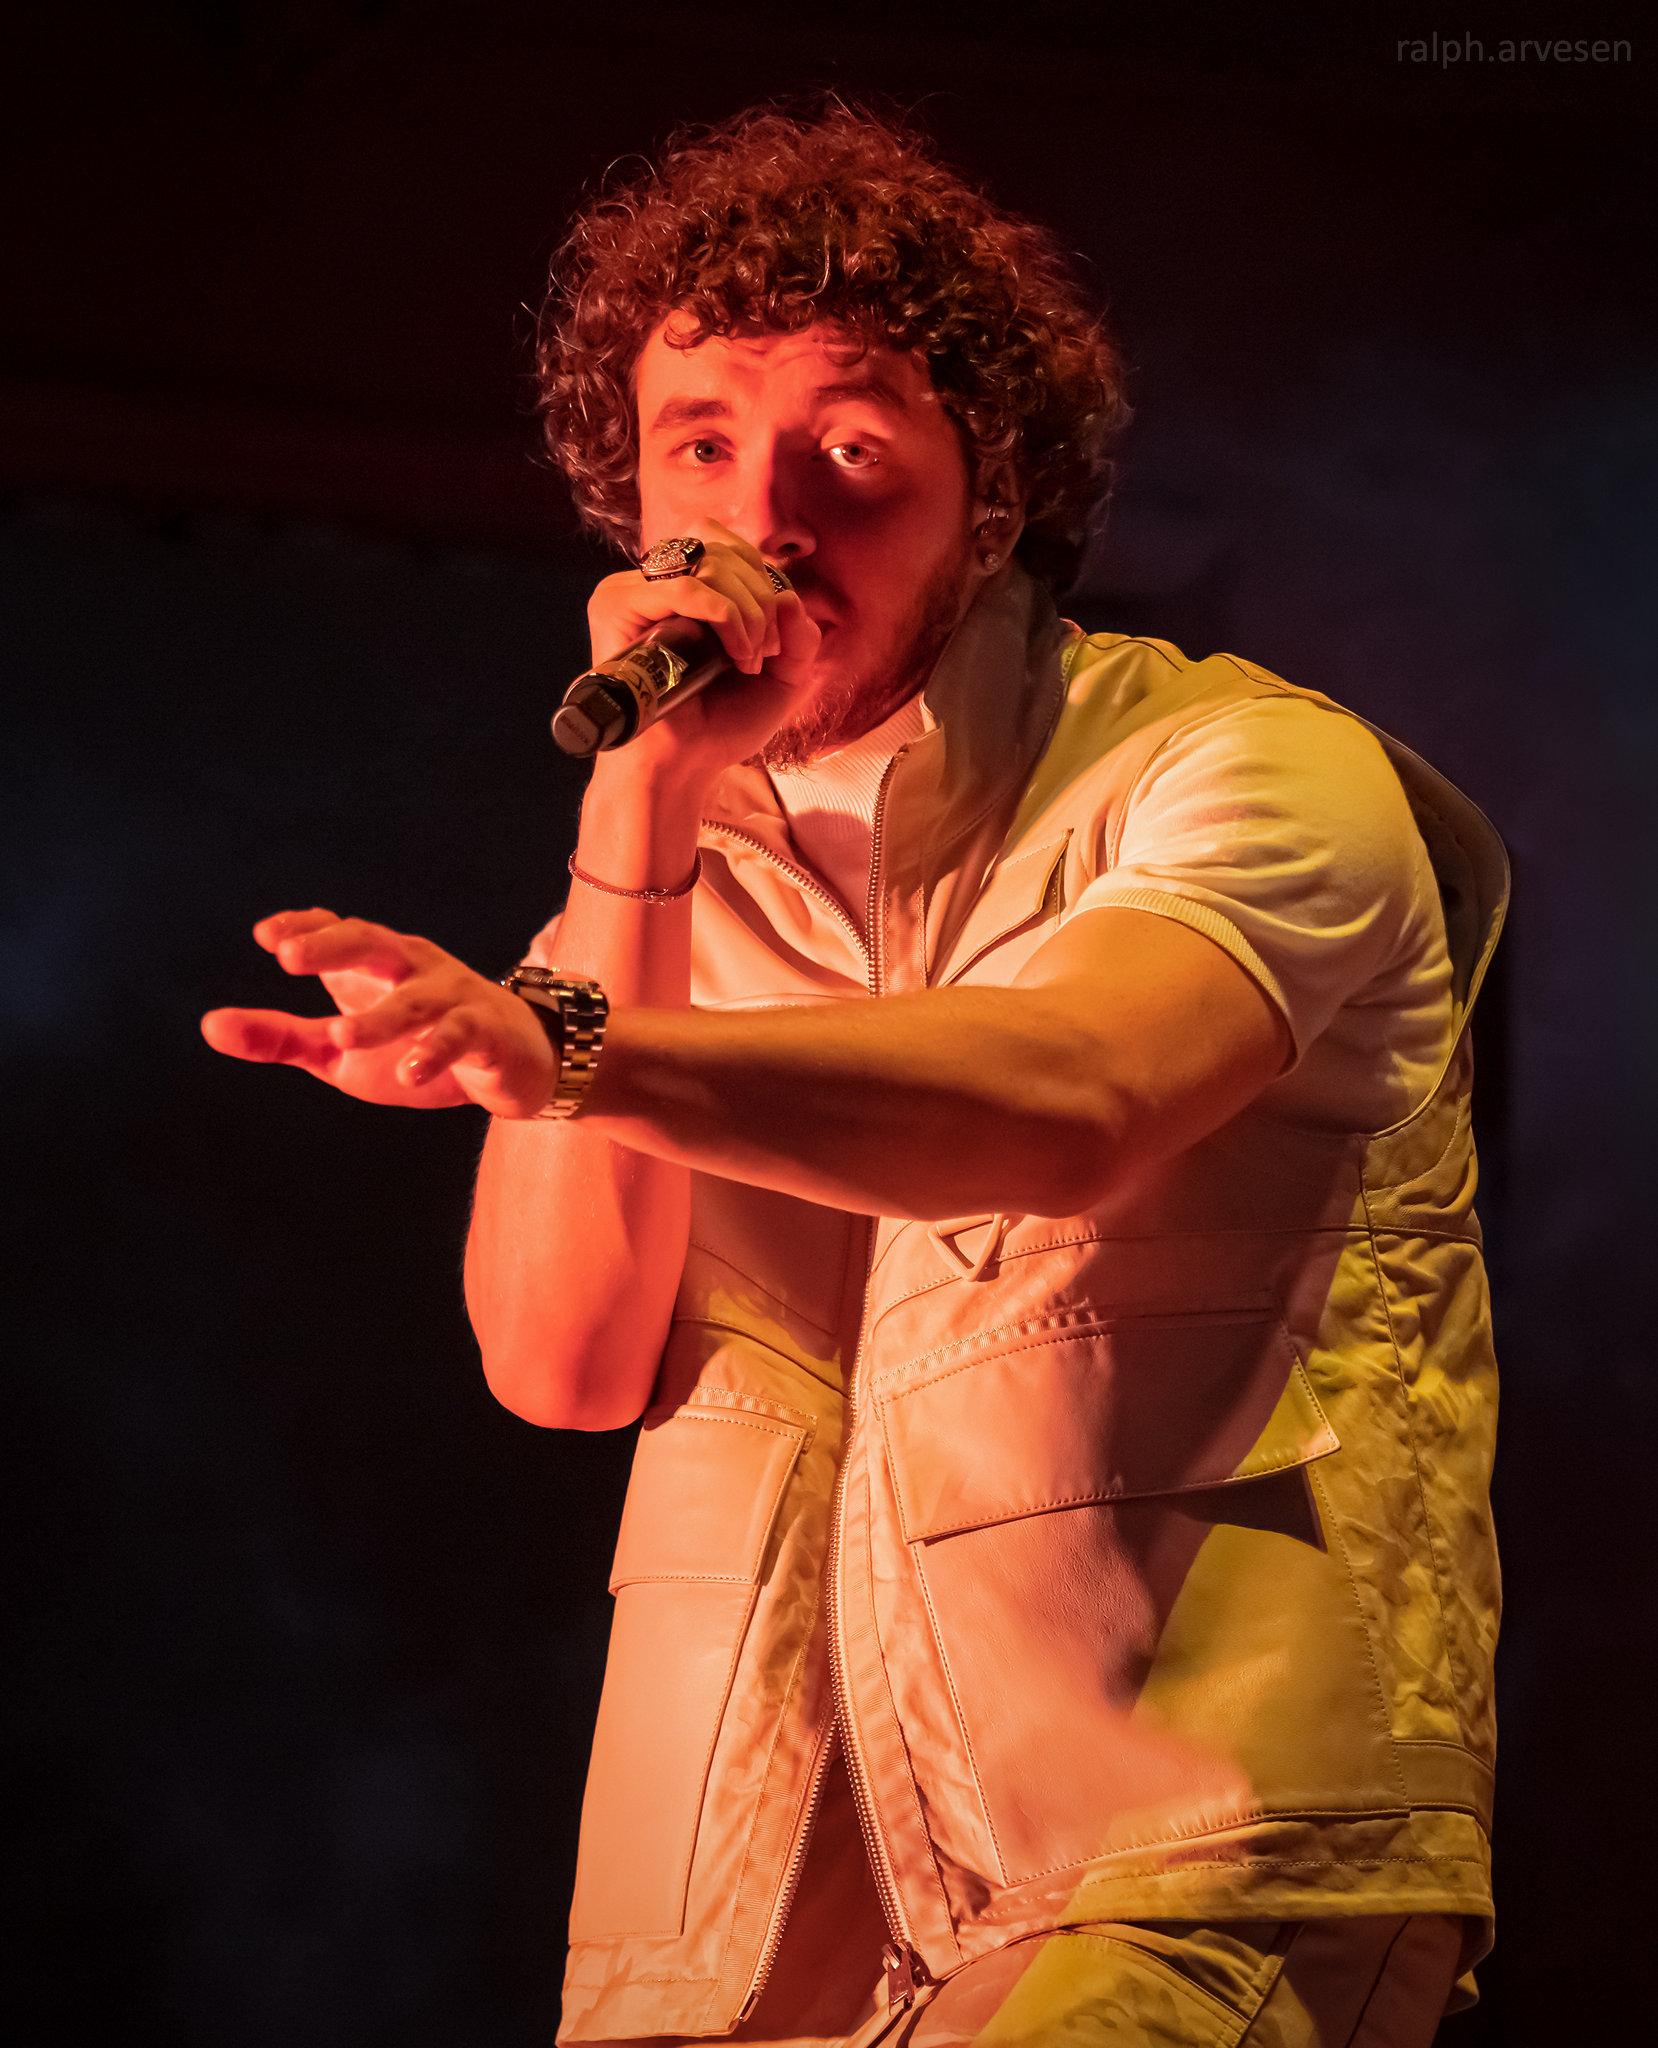 Austin City Limits Music Festival | Texas Review | Ralph Arvesen